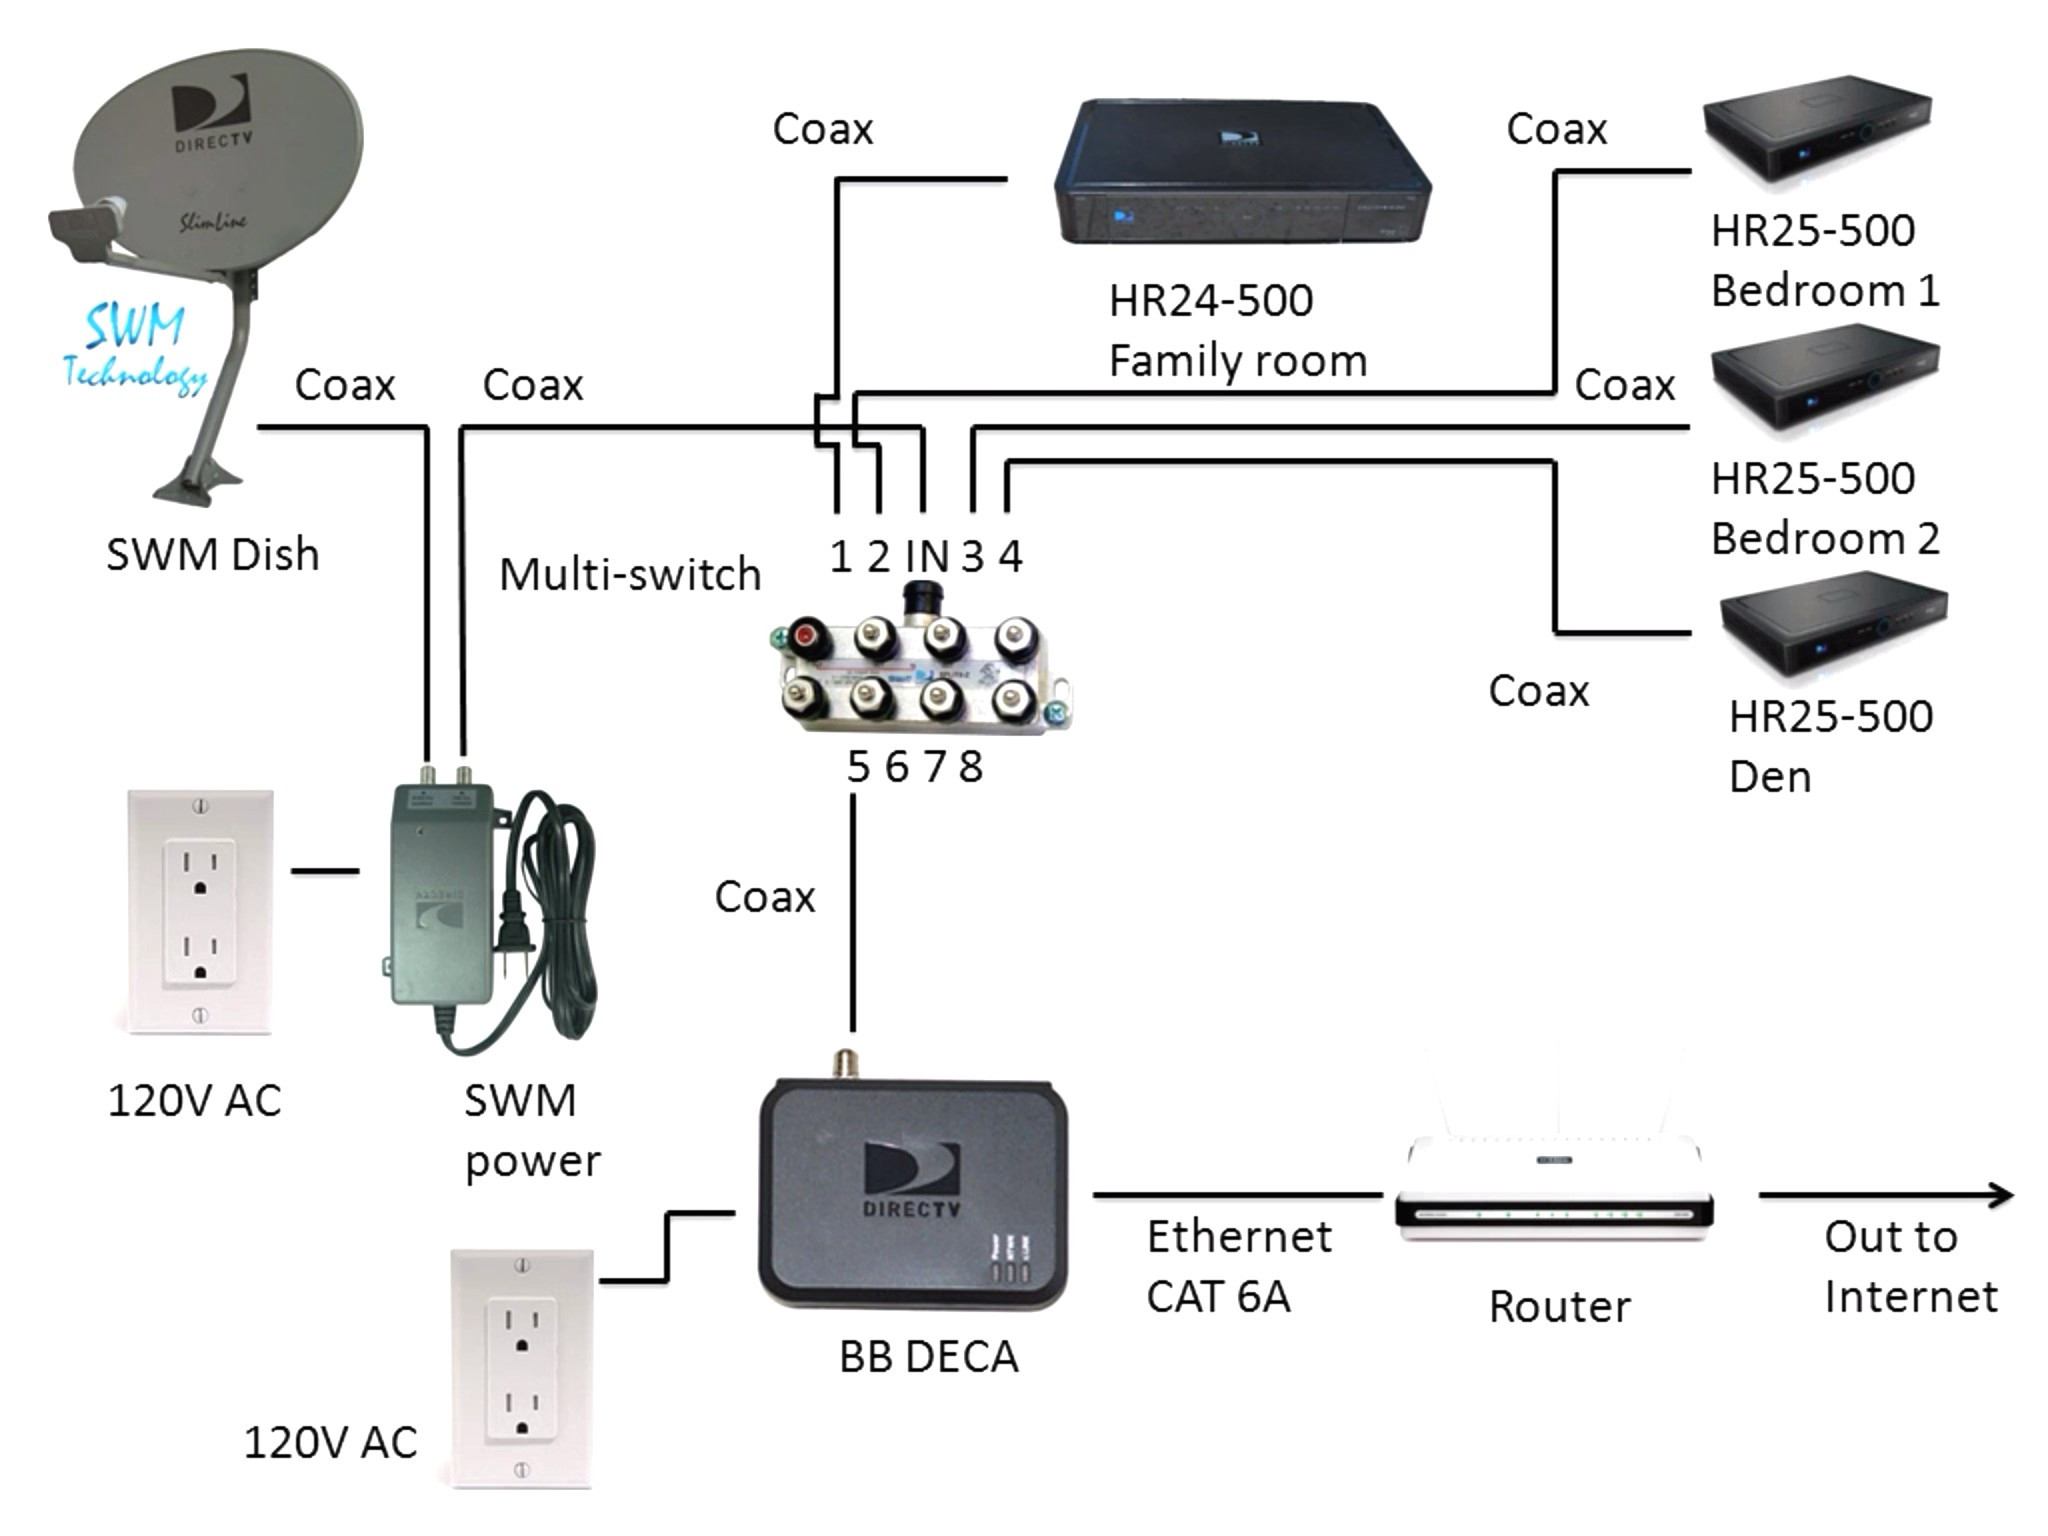 directv swm 32 wiring diagram Download-Direct Tv Wiring Diagram Beautiful Directv Swm Diagrams And Resources Simple Dish Network 15-i